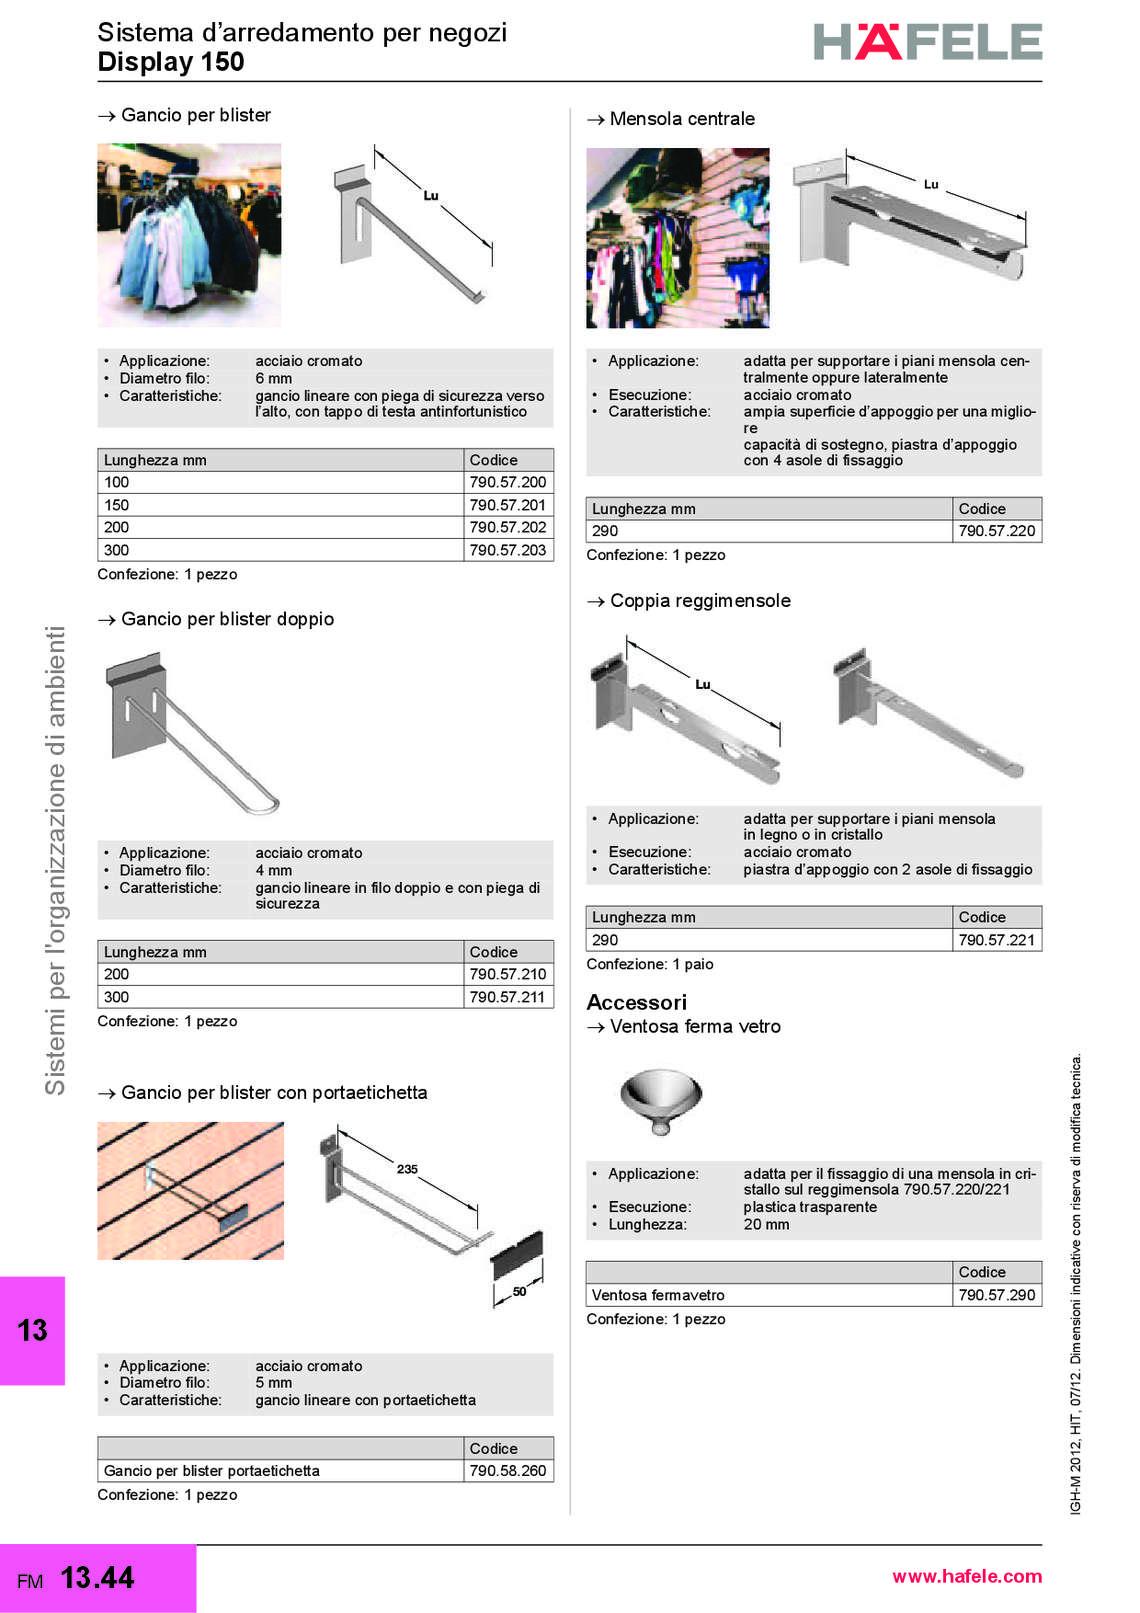 hafele-arredo-negozi-e-farmacie_32_055.jpg